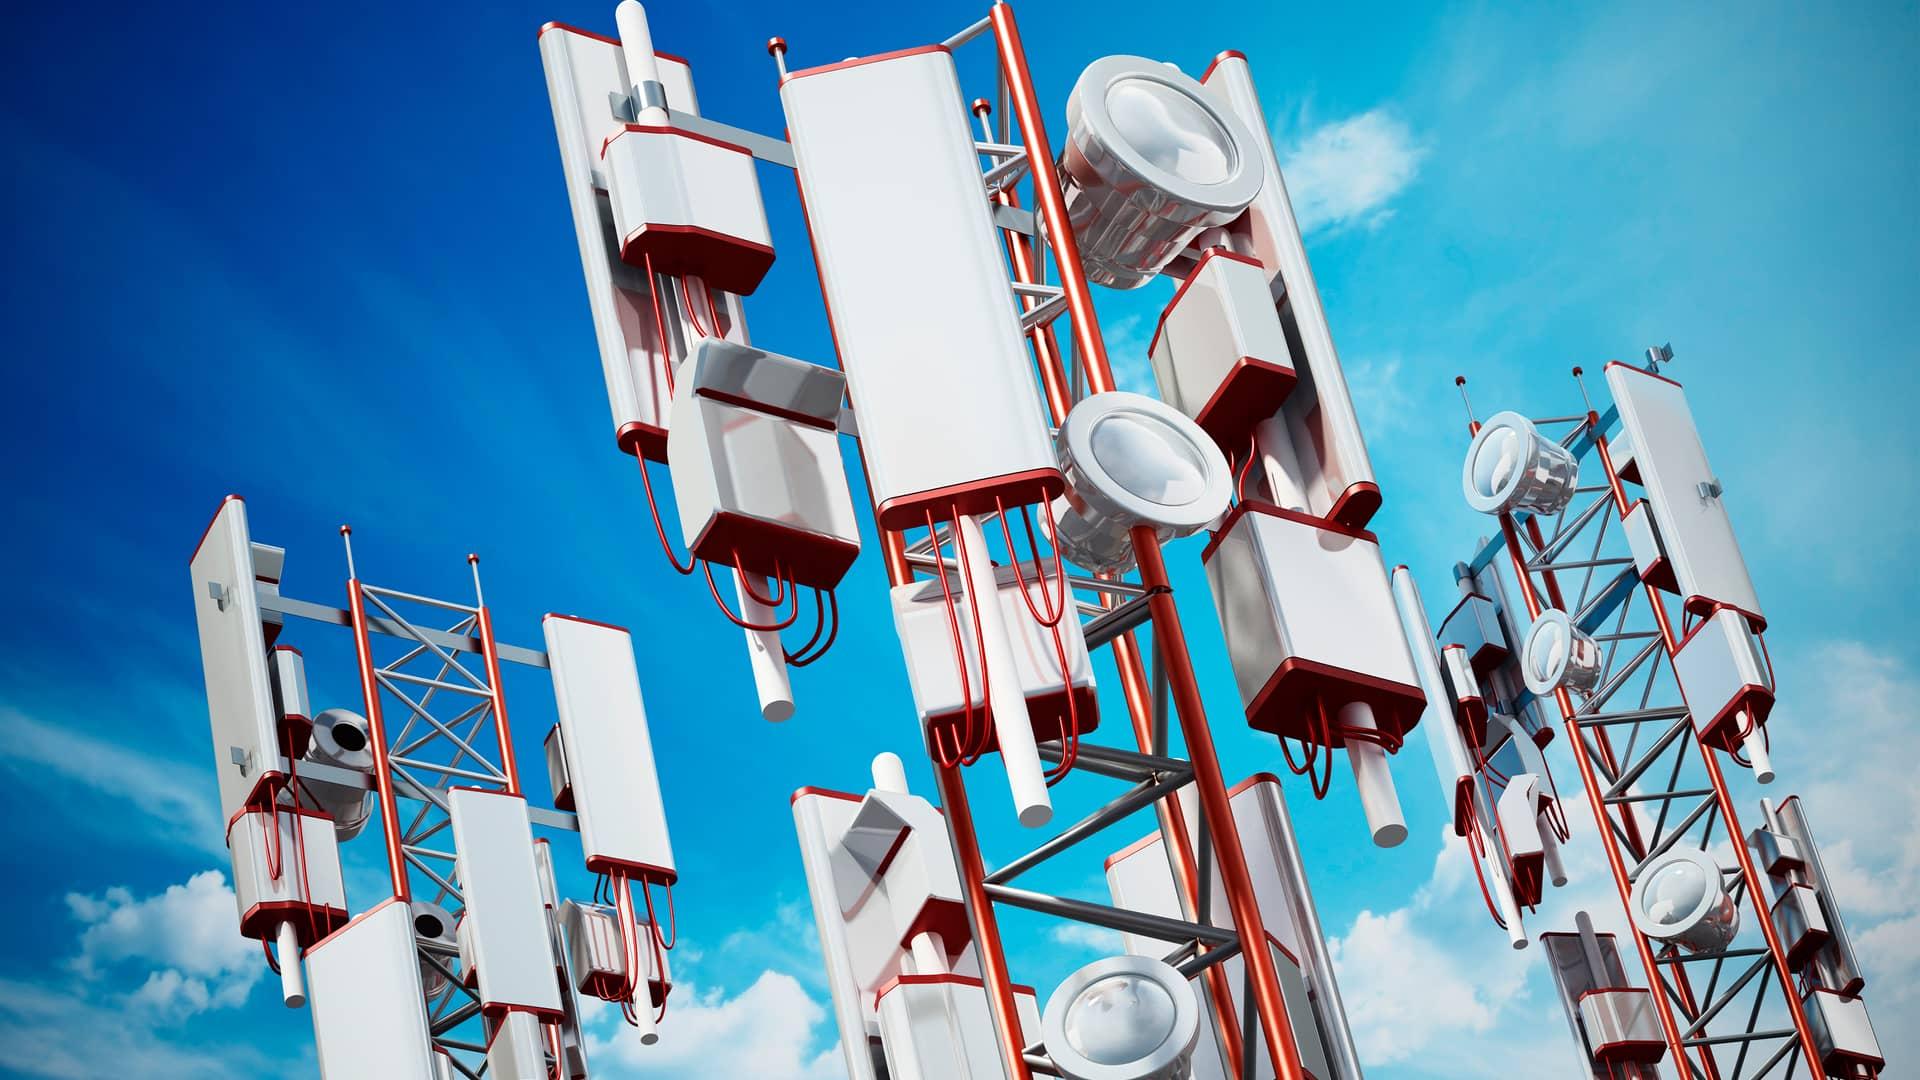 Torres de antena de cobertura 5g de pepephone